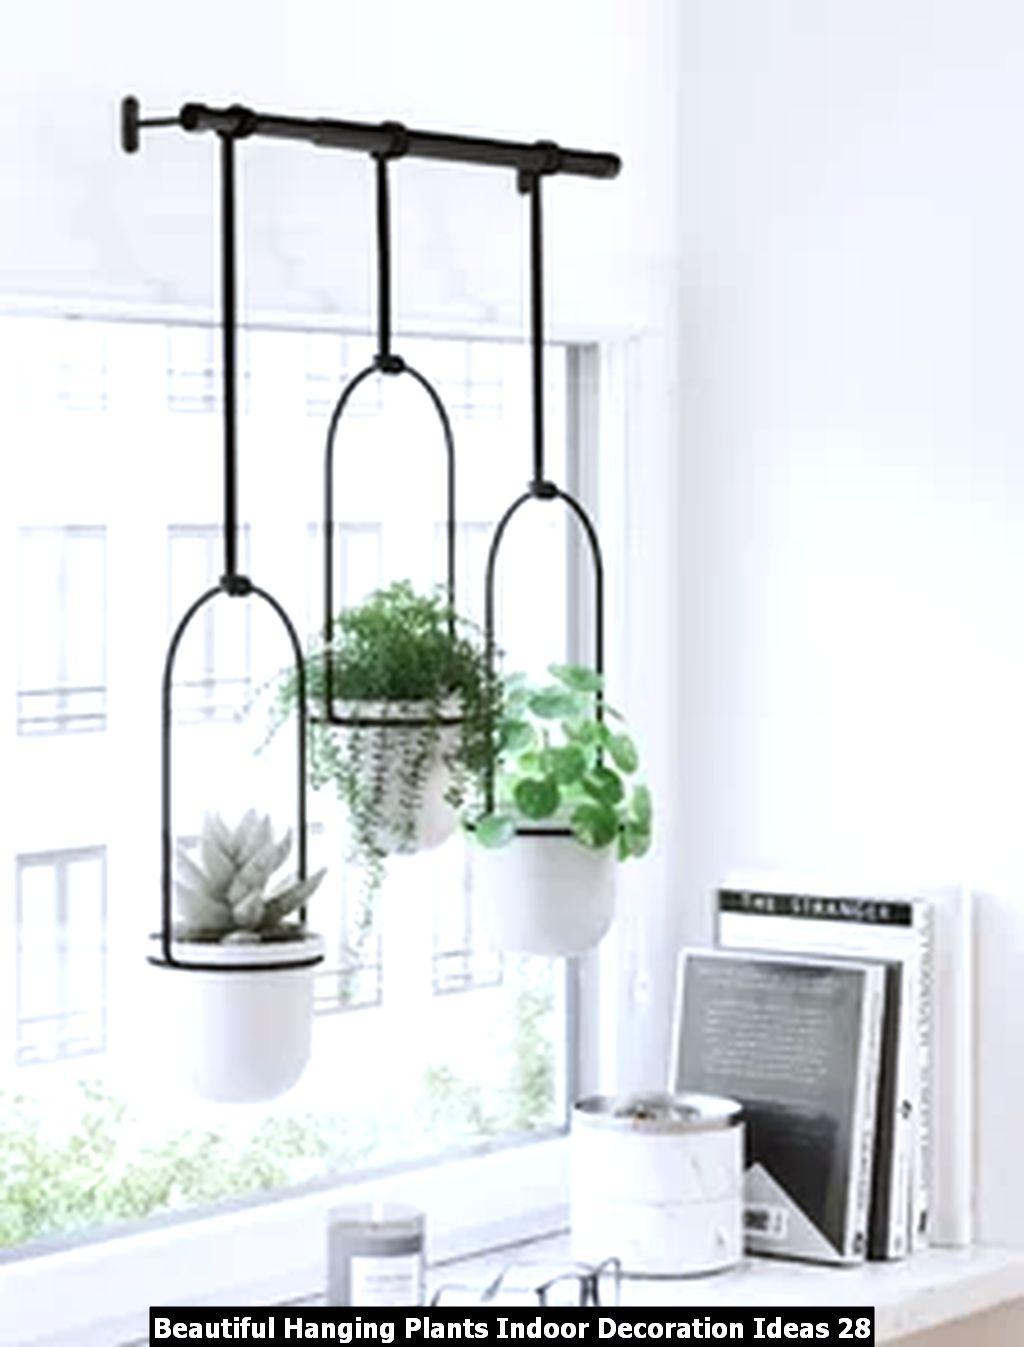 Beautiful Hanging Plants Indoor Decoration Ideas 28